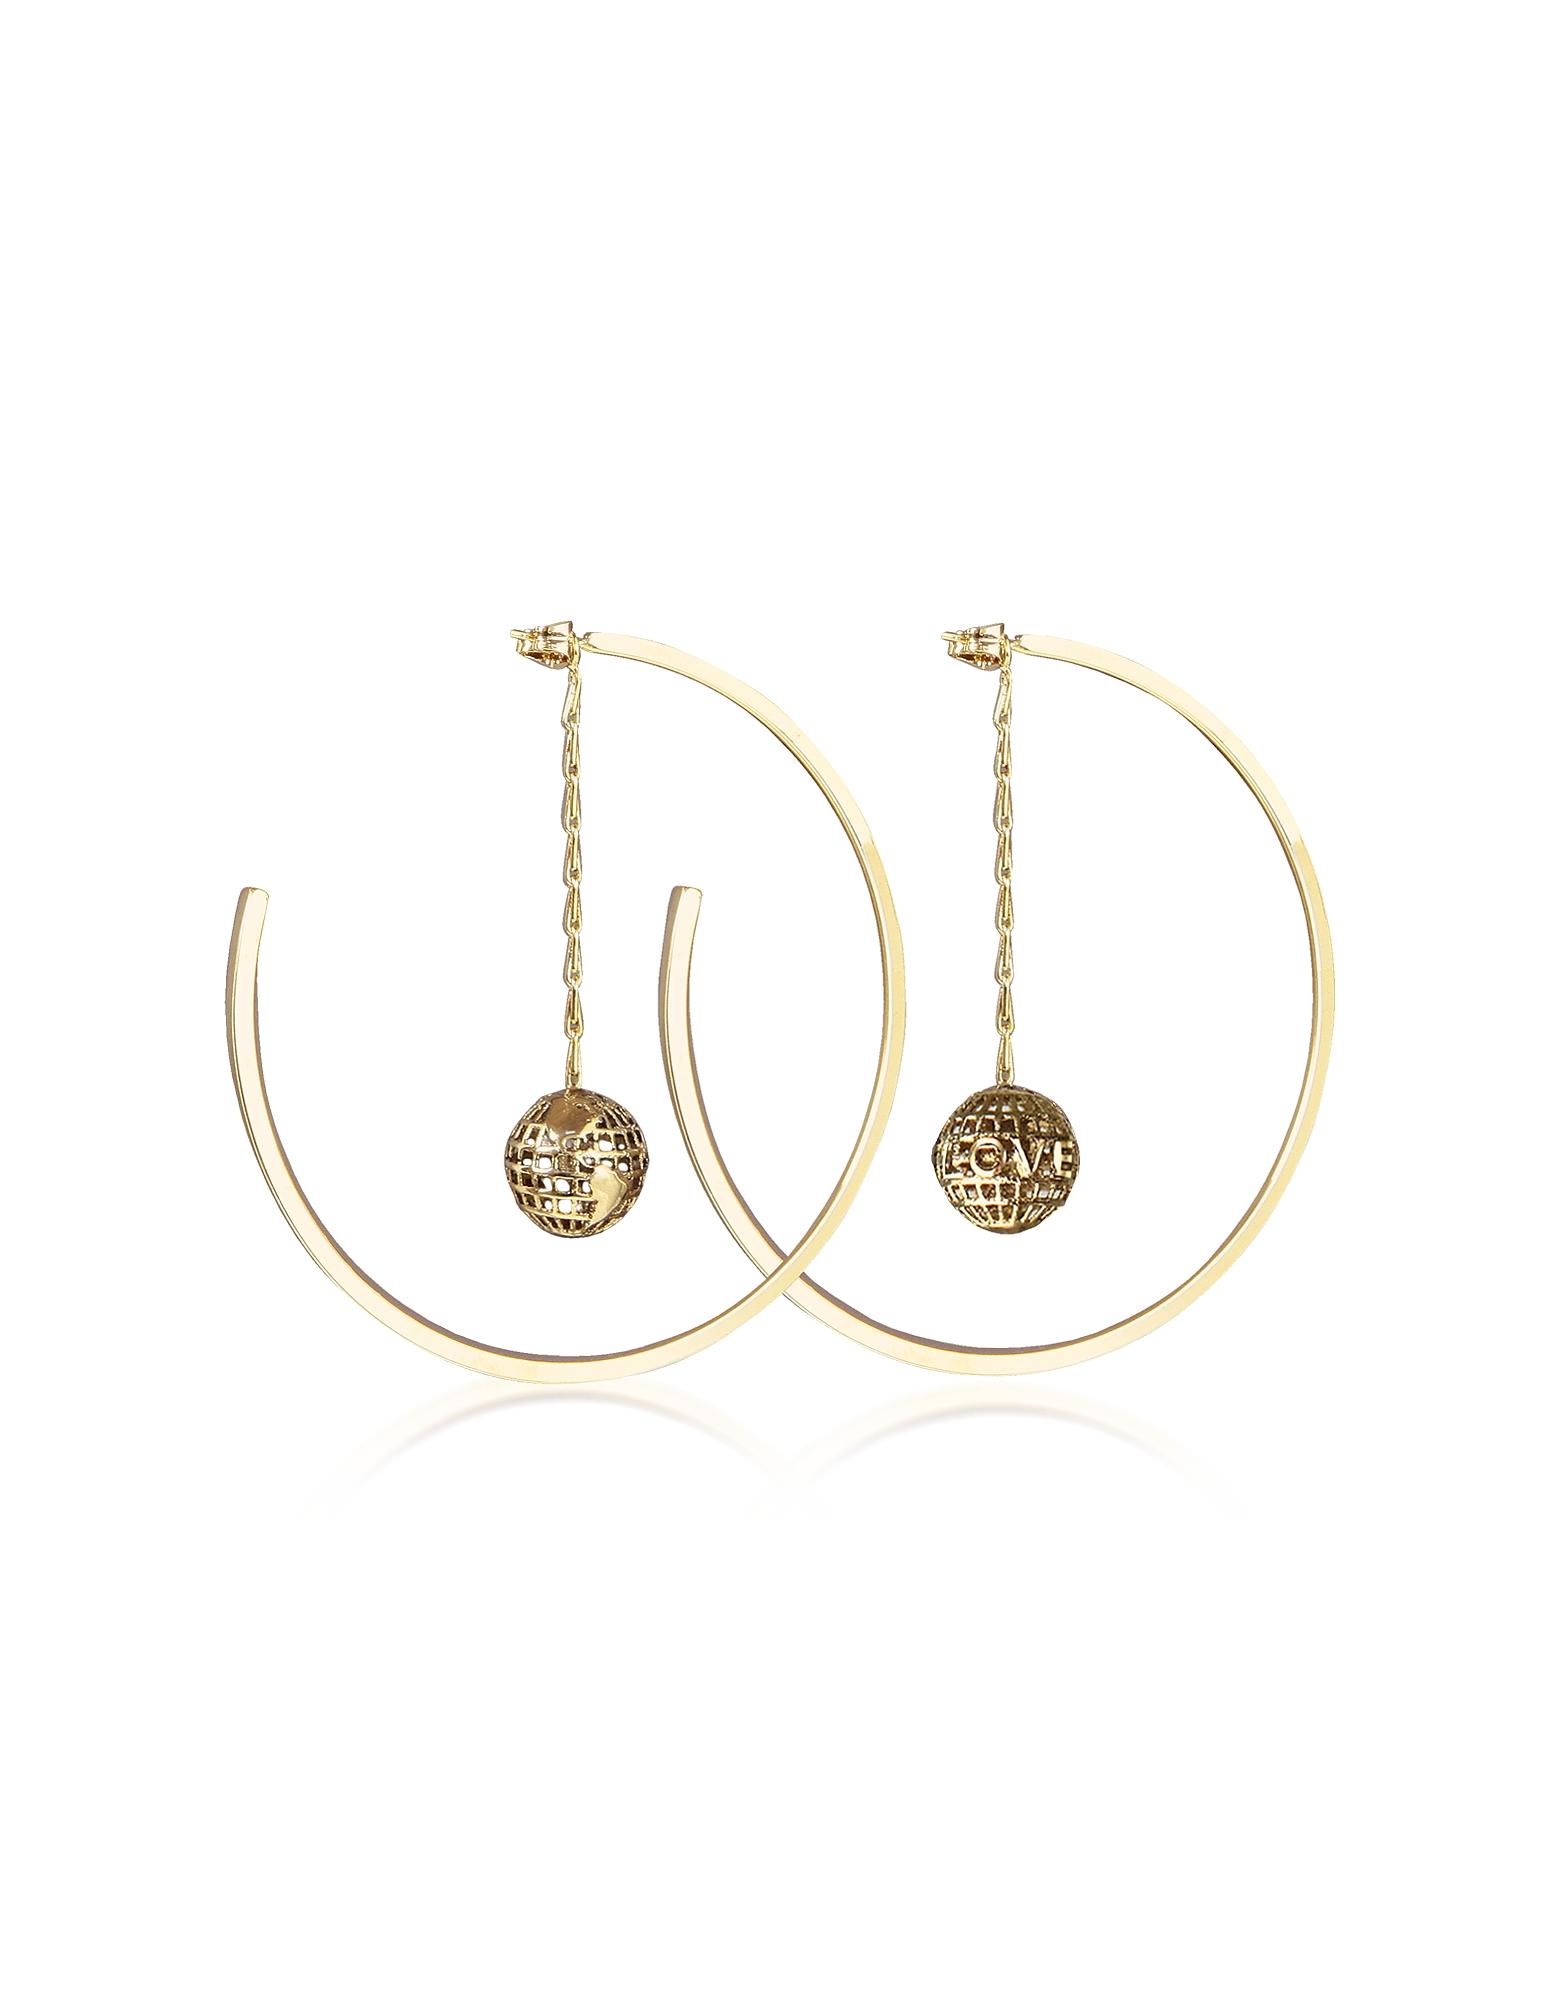 Forzieri coupon: Maissa  Earrings Blin Blin Earrings